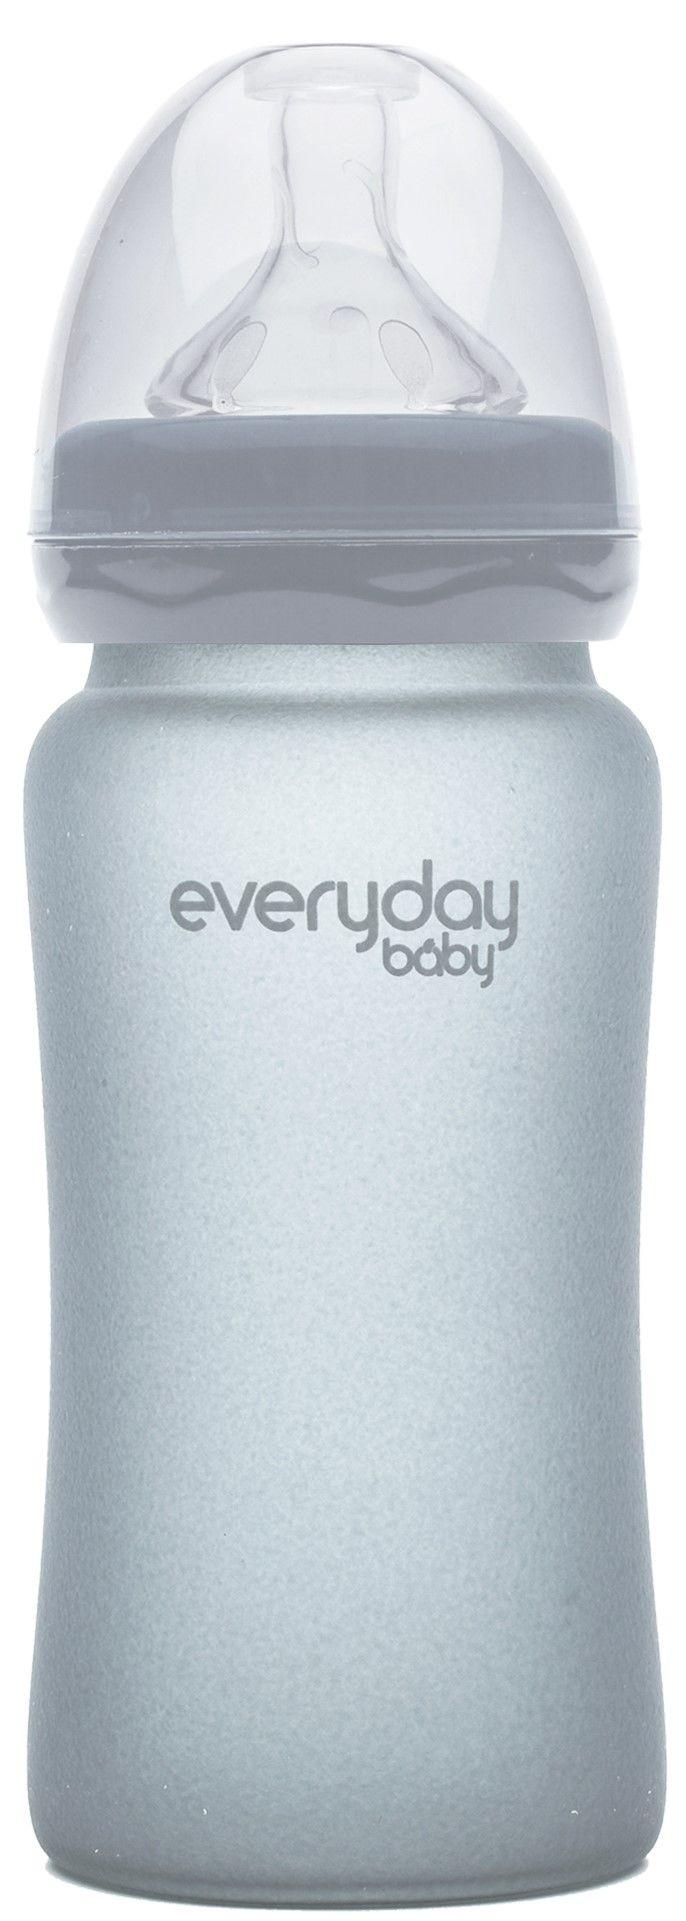 Everyday Baby Nappflaska 240 ml, Quiet Grey